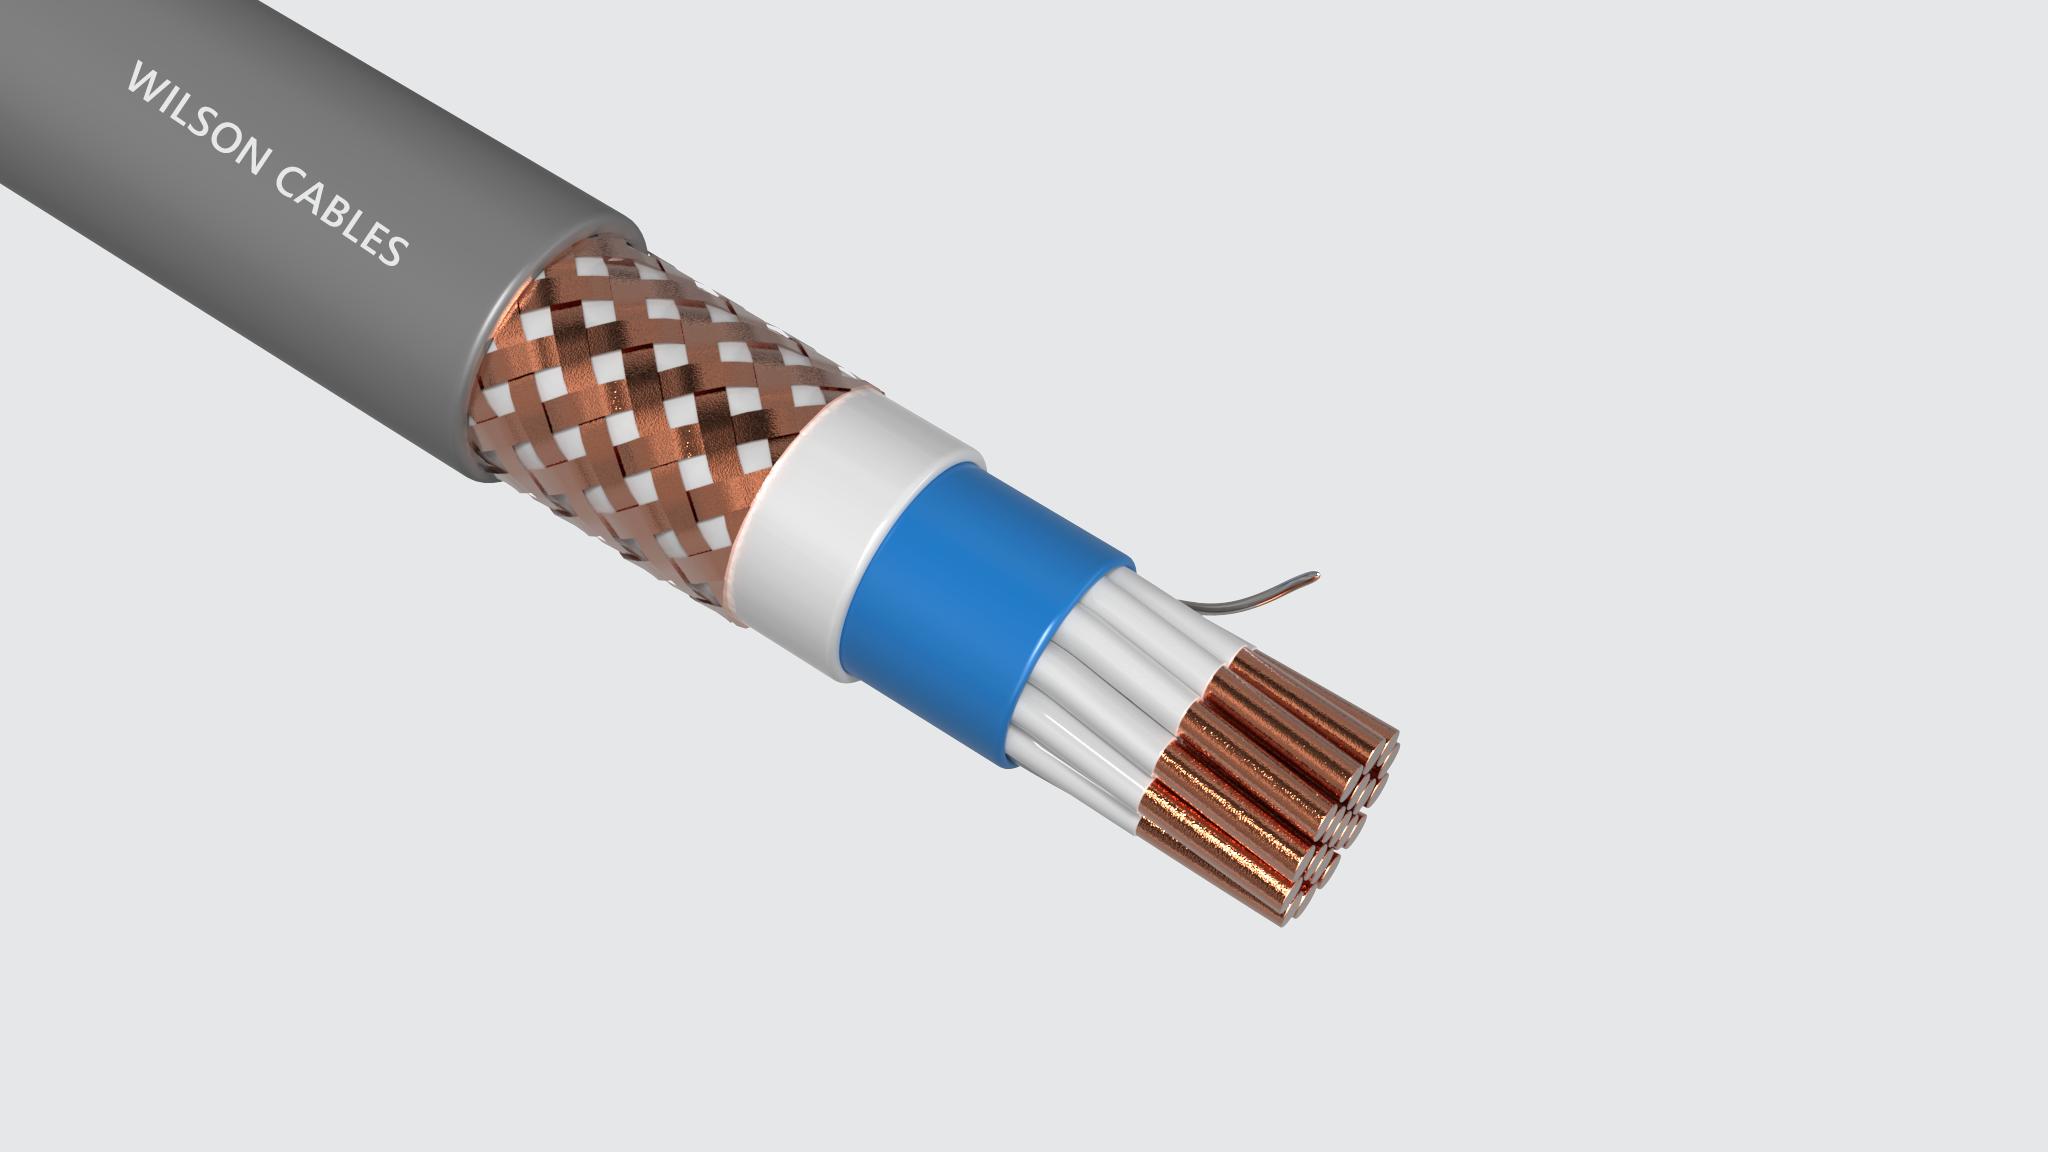 MIM-210Q (SST) / MIM-210C (SST) PVC Sheathed Shipboard Braided Instrumentation Cables